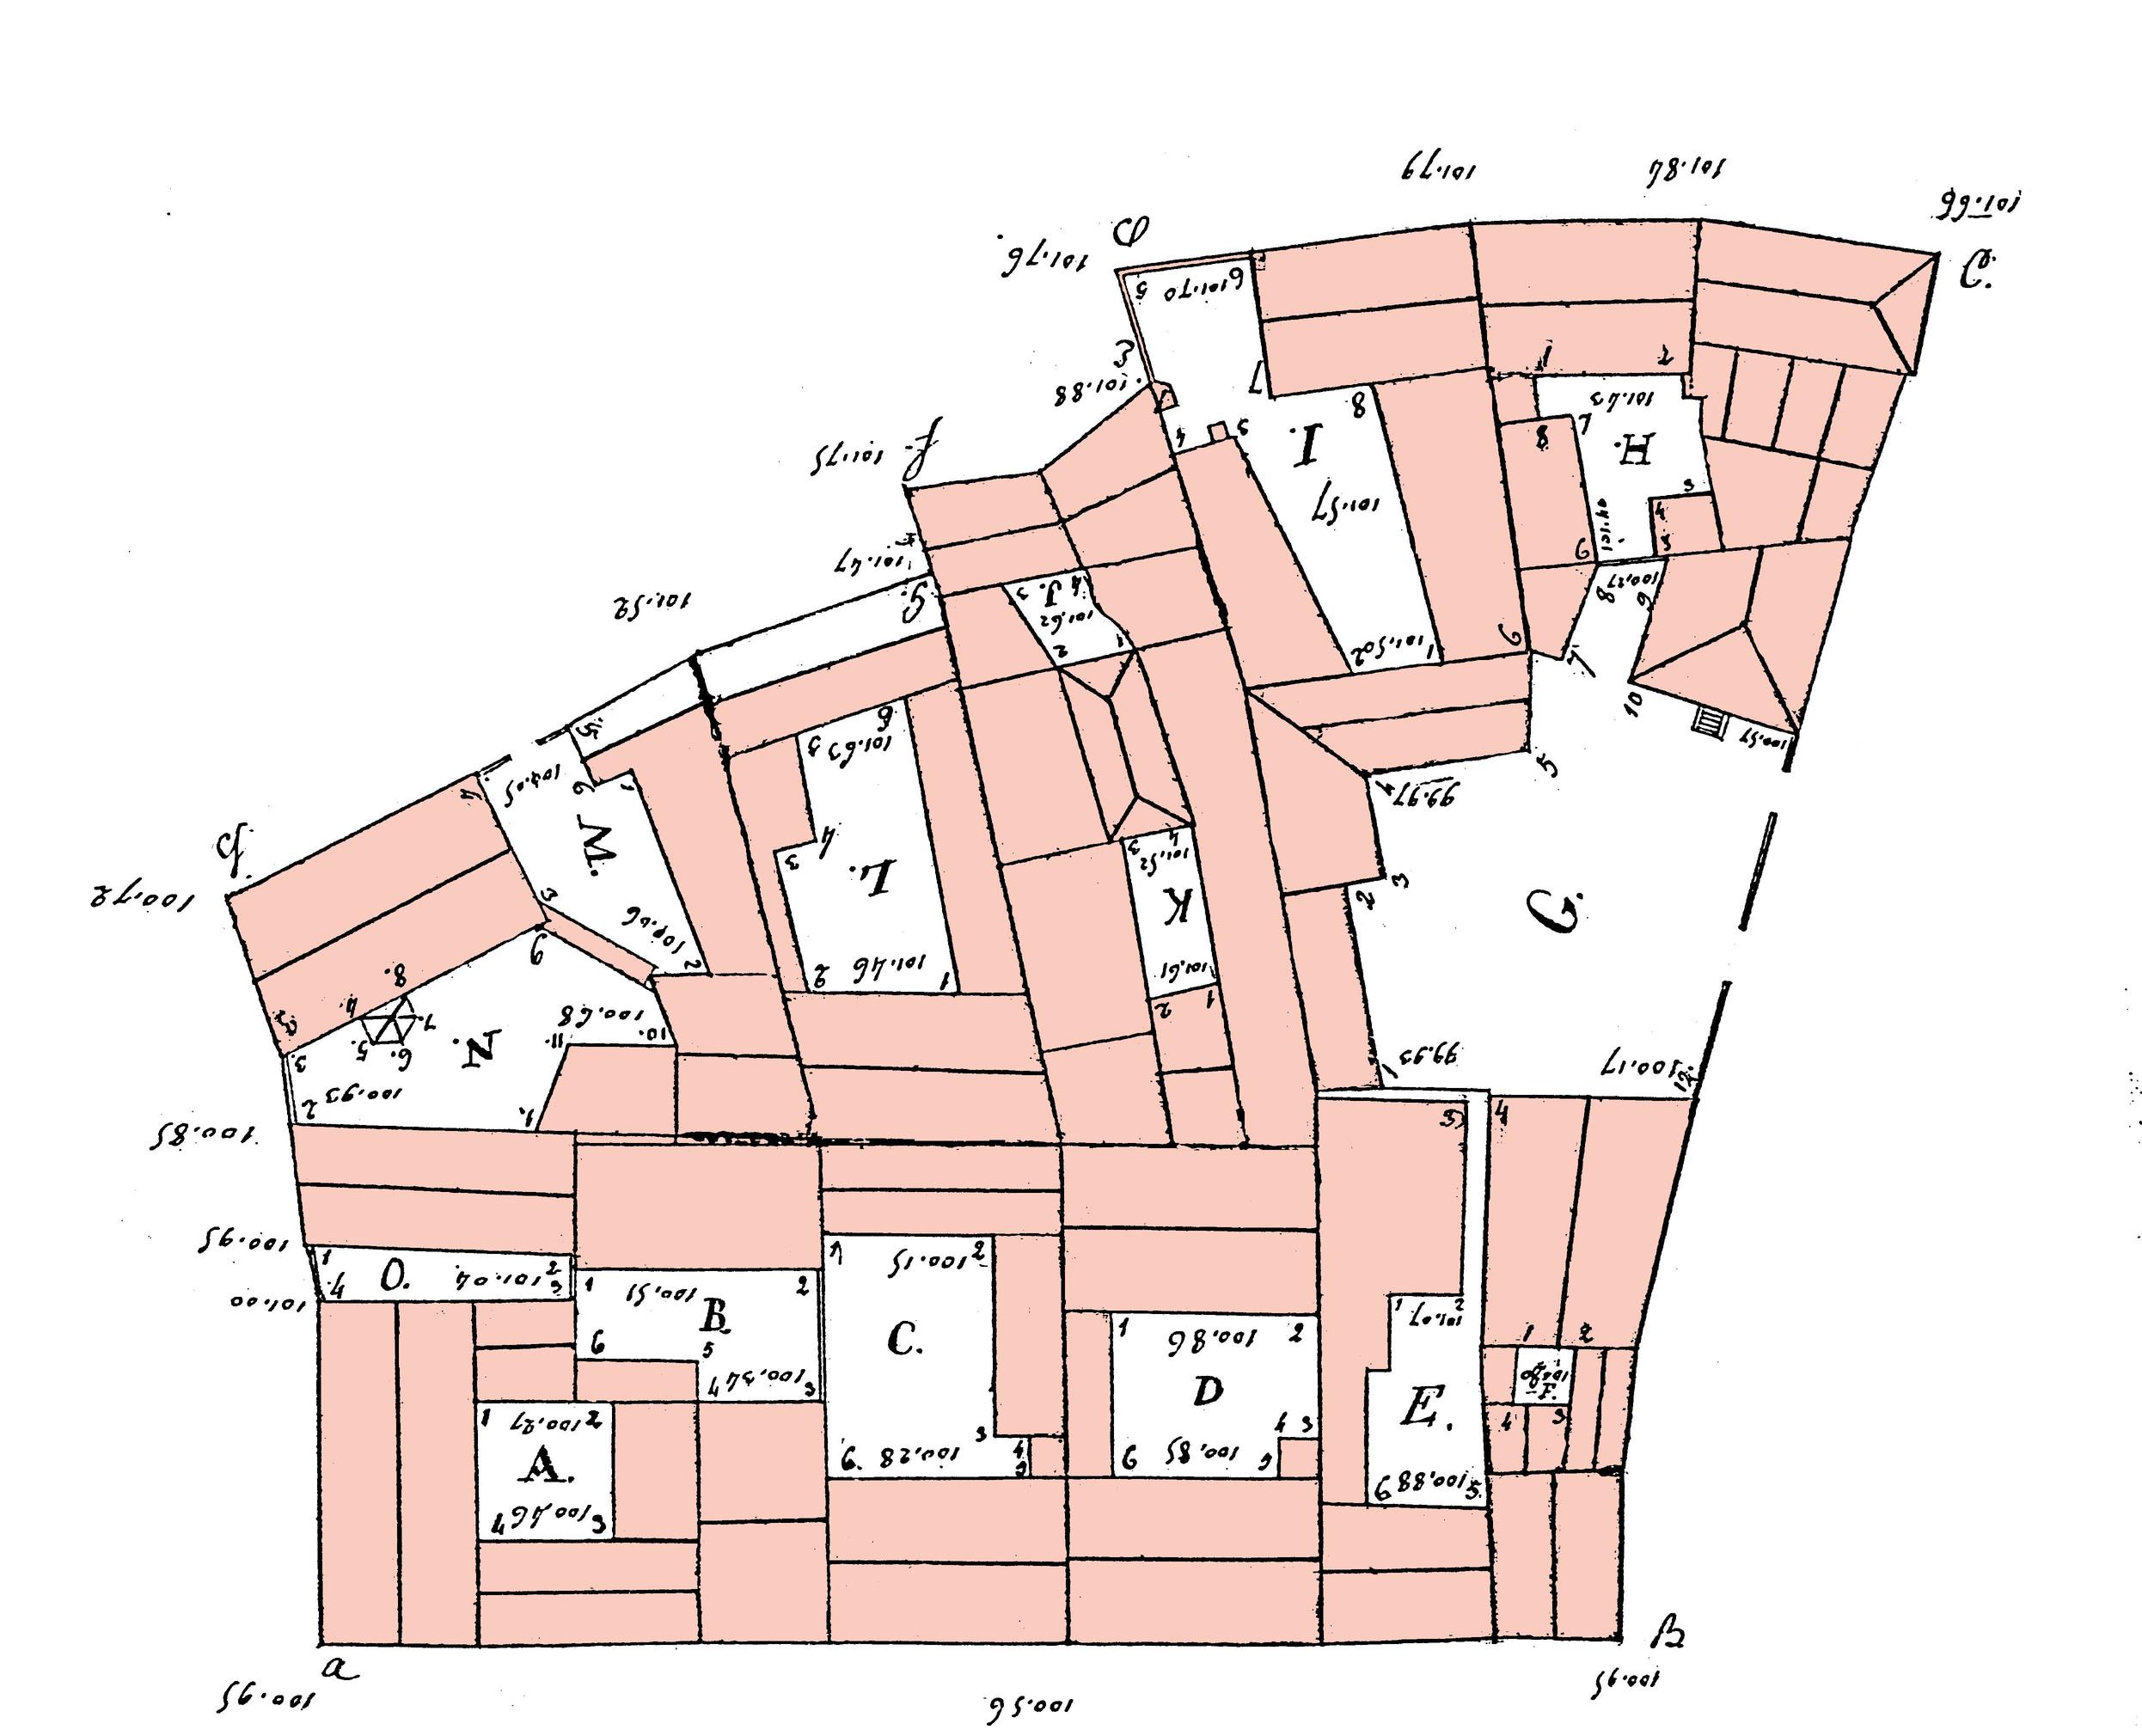 Maisons de Strasbourg » Résultats de recherche » redslob